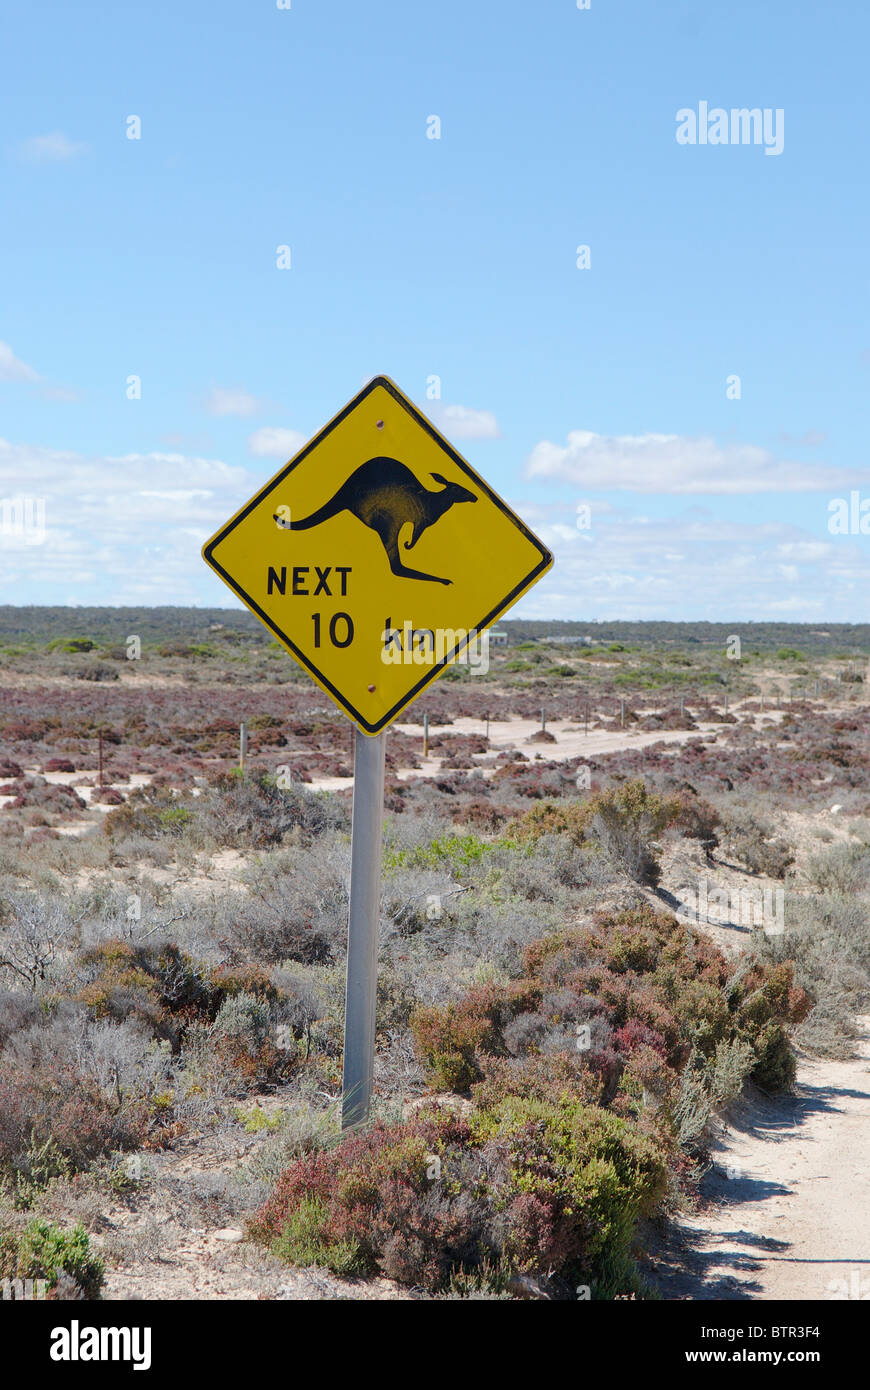 Australia, Kangaroo crossing sign - Stock Image